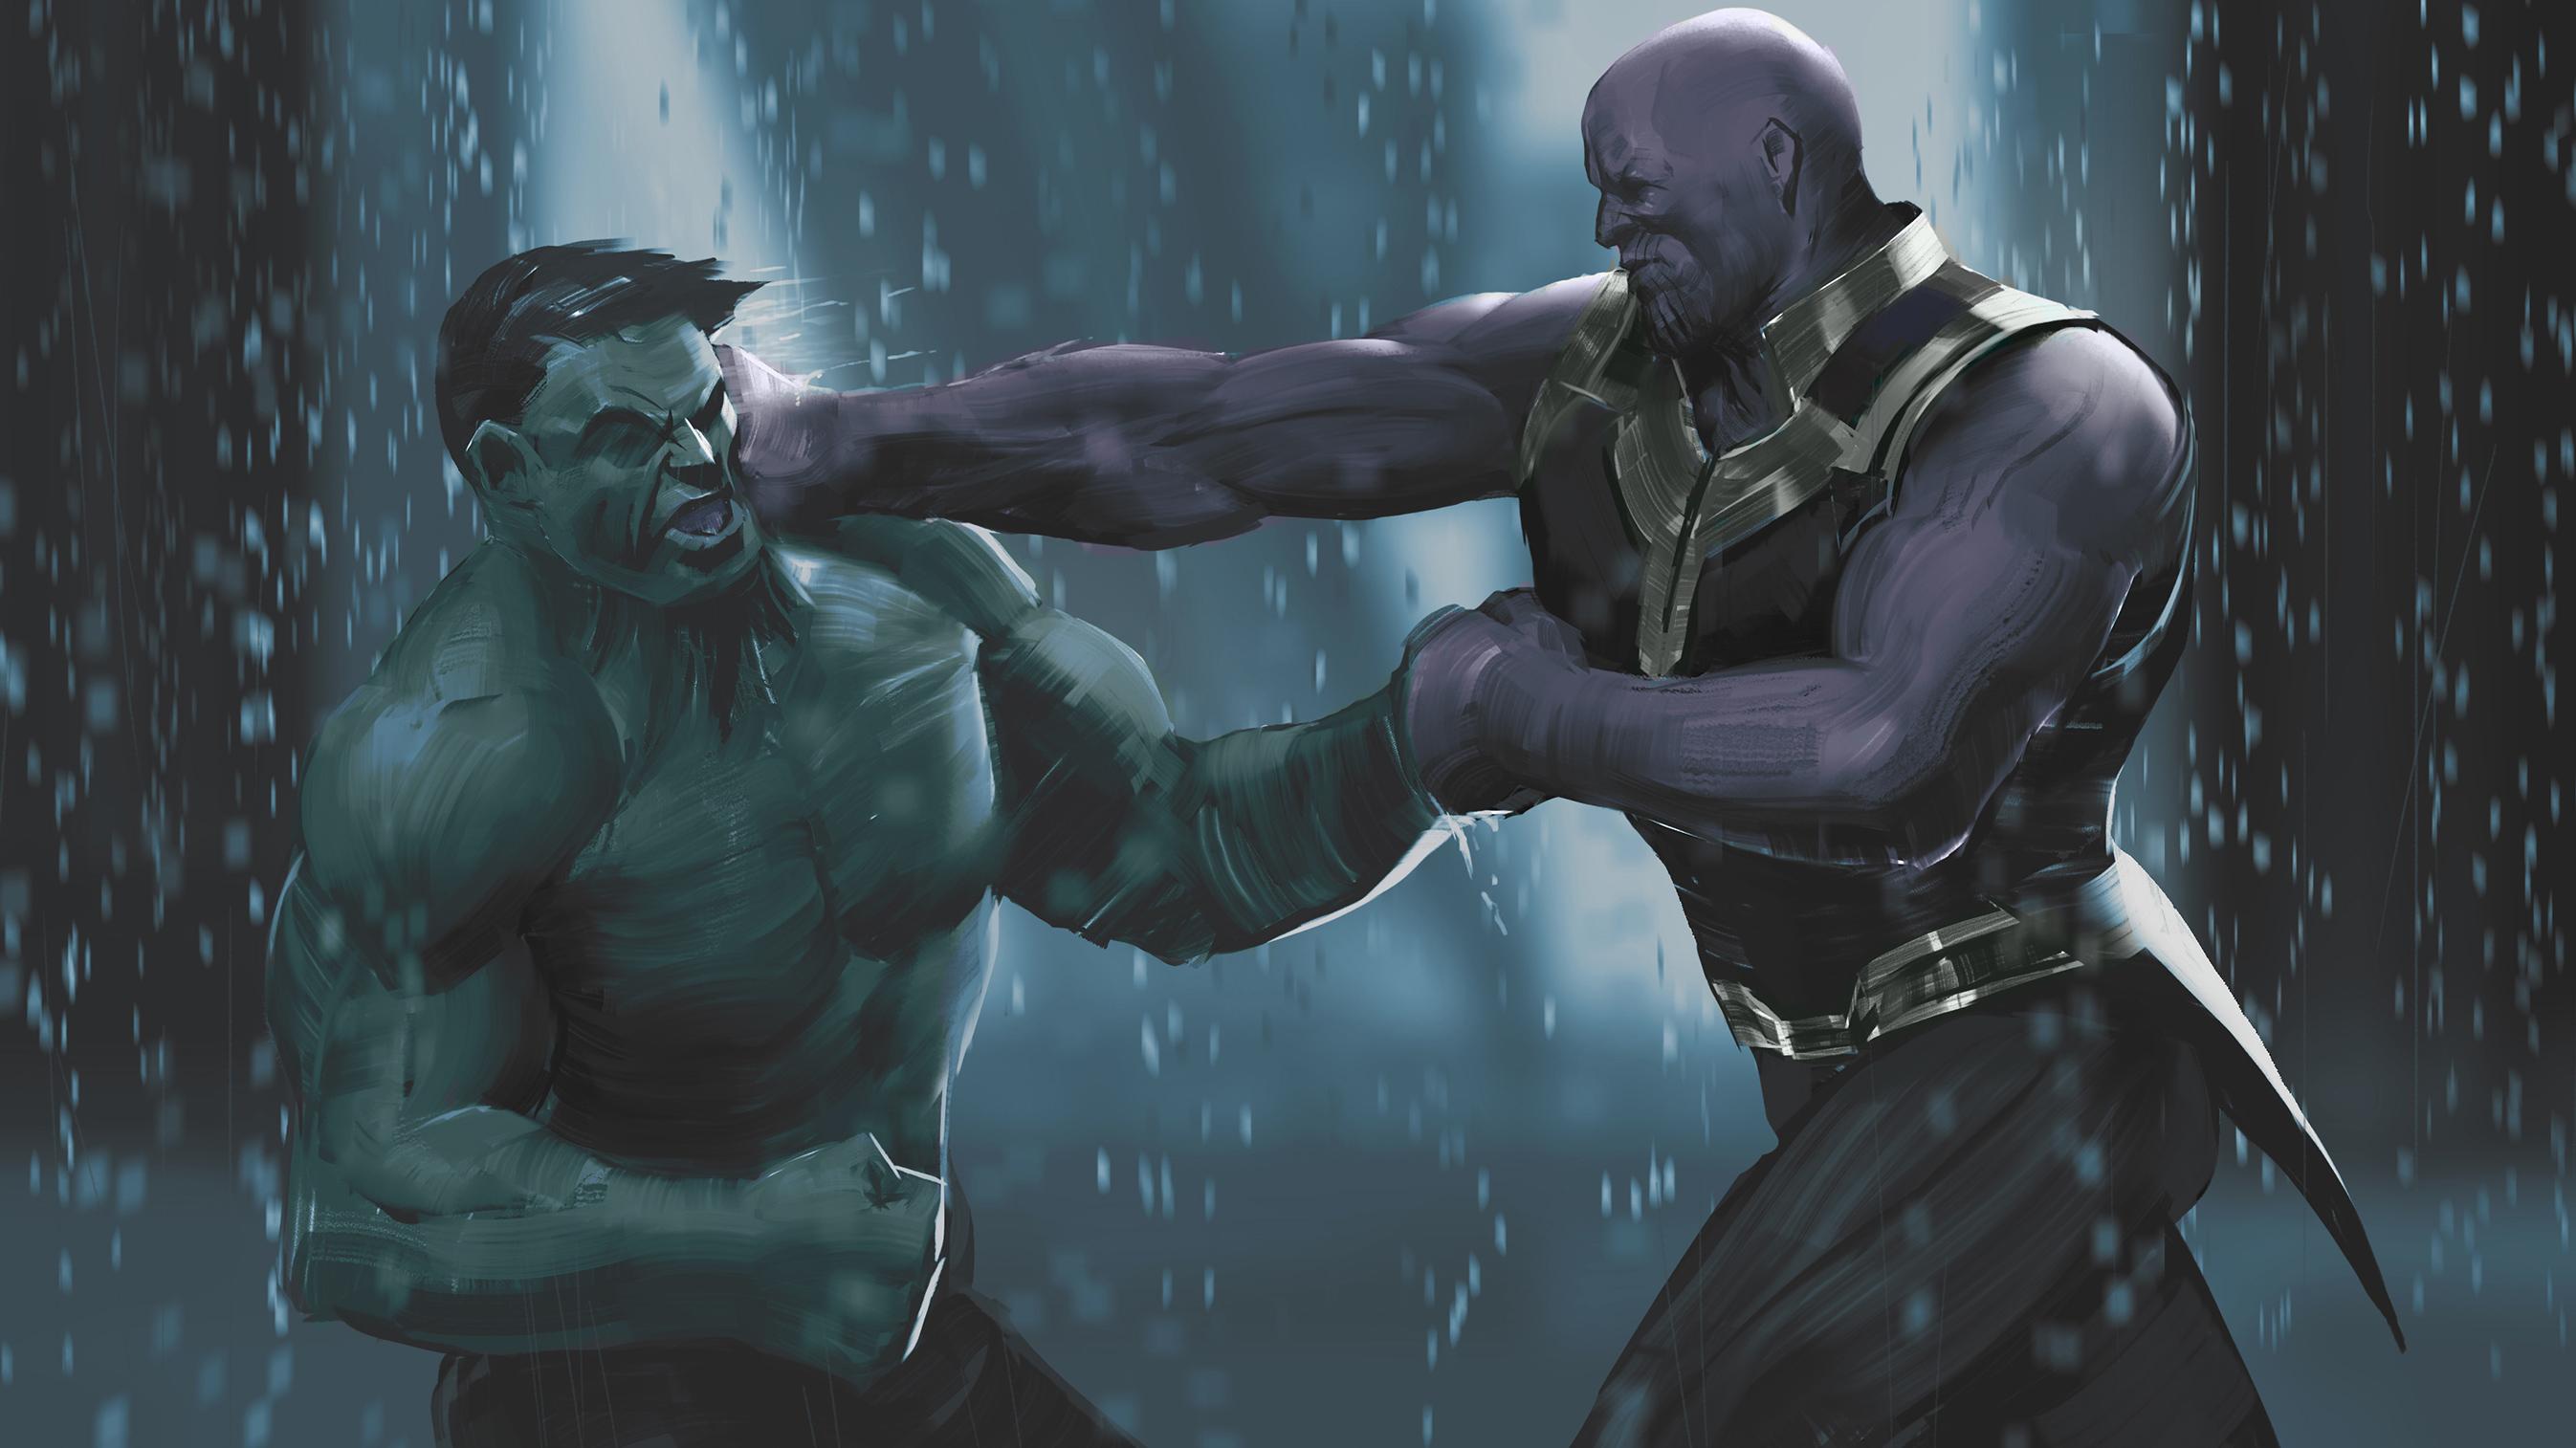 Avengers Infinity War HD Wallpaper Background Image 2693x1514 2693x1514